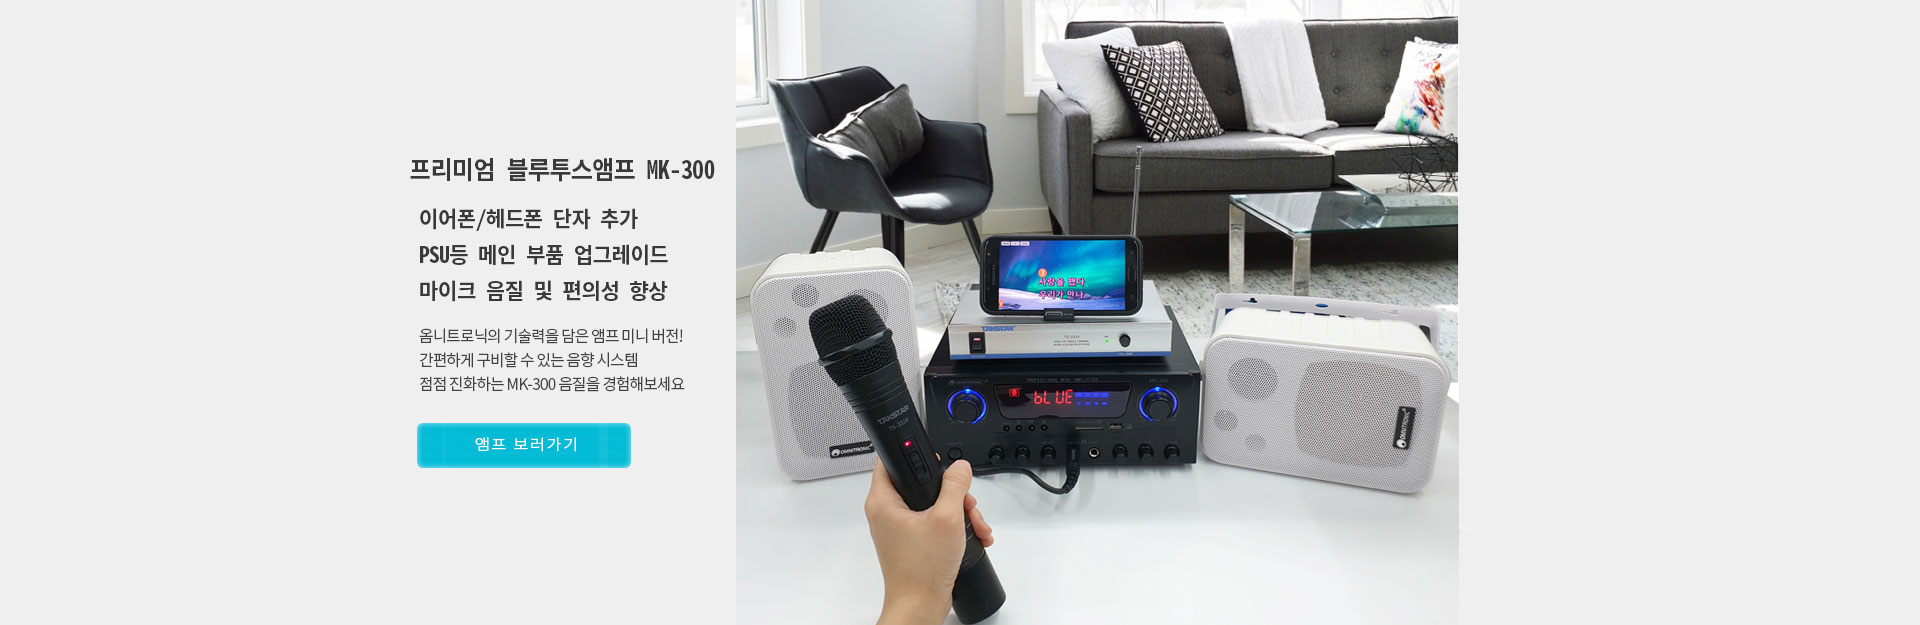 MK-300